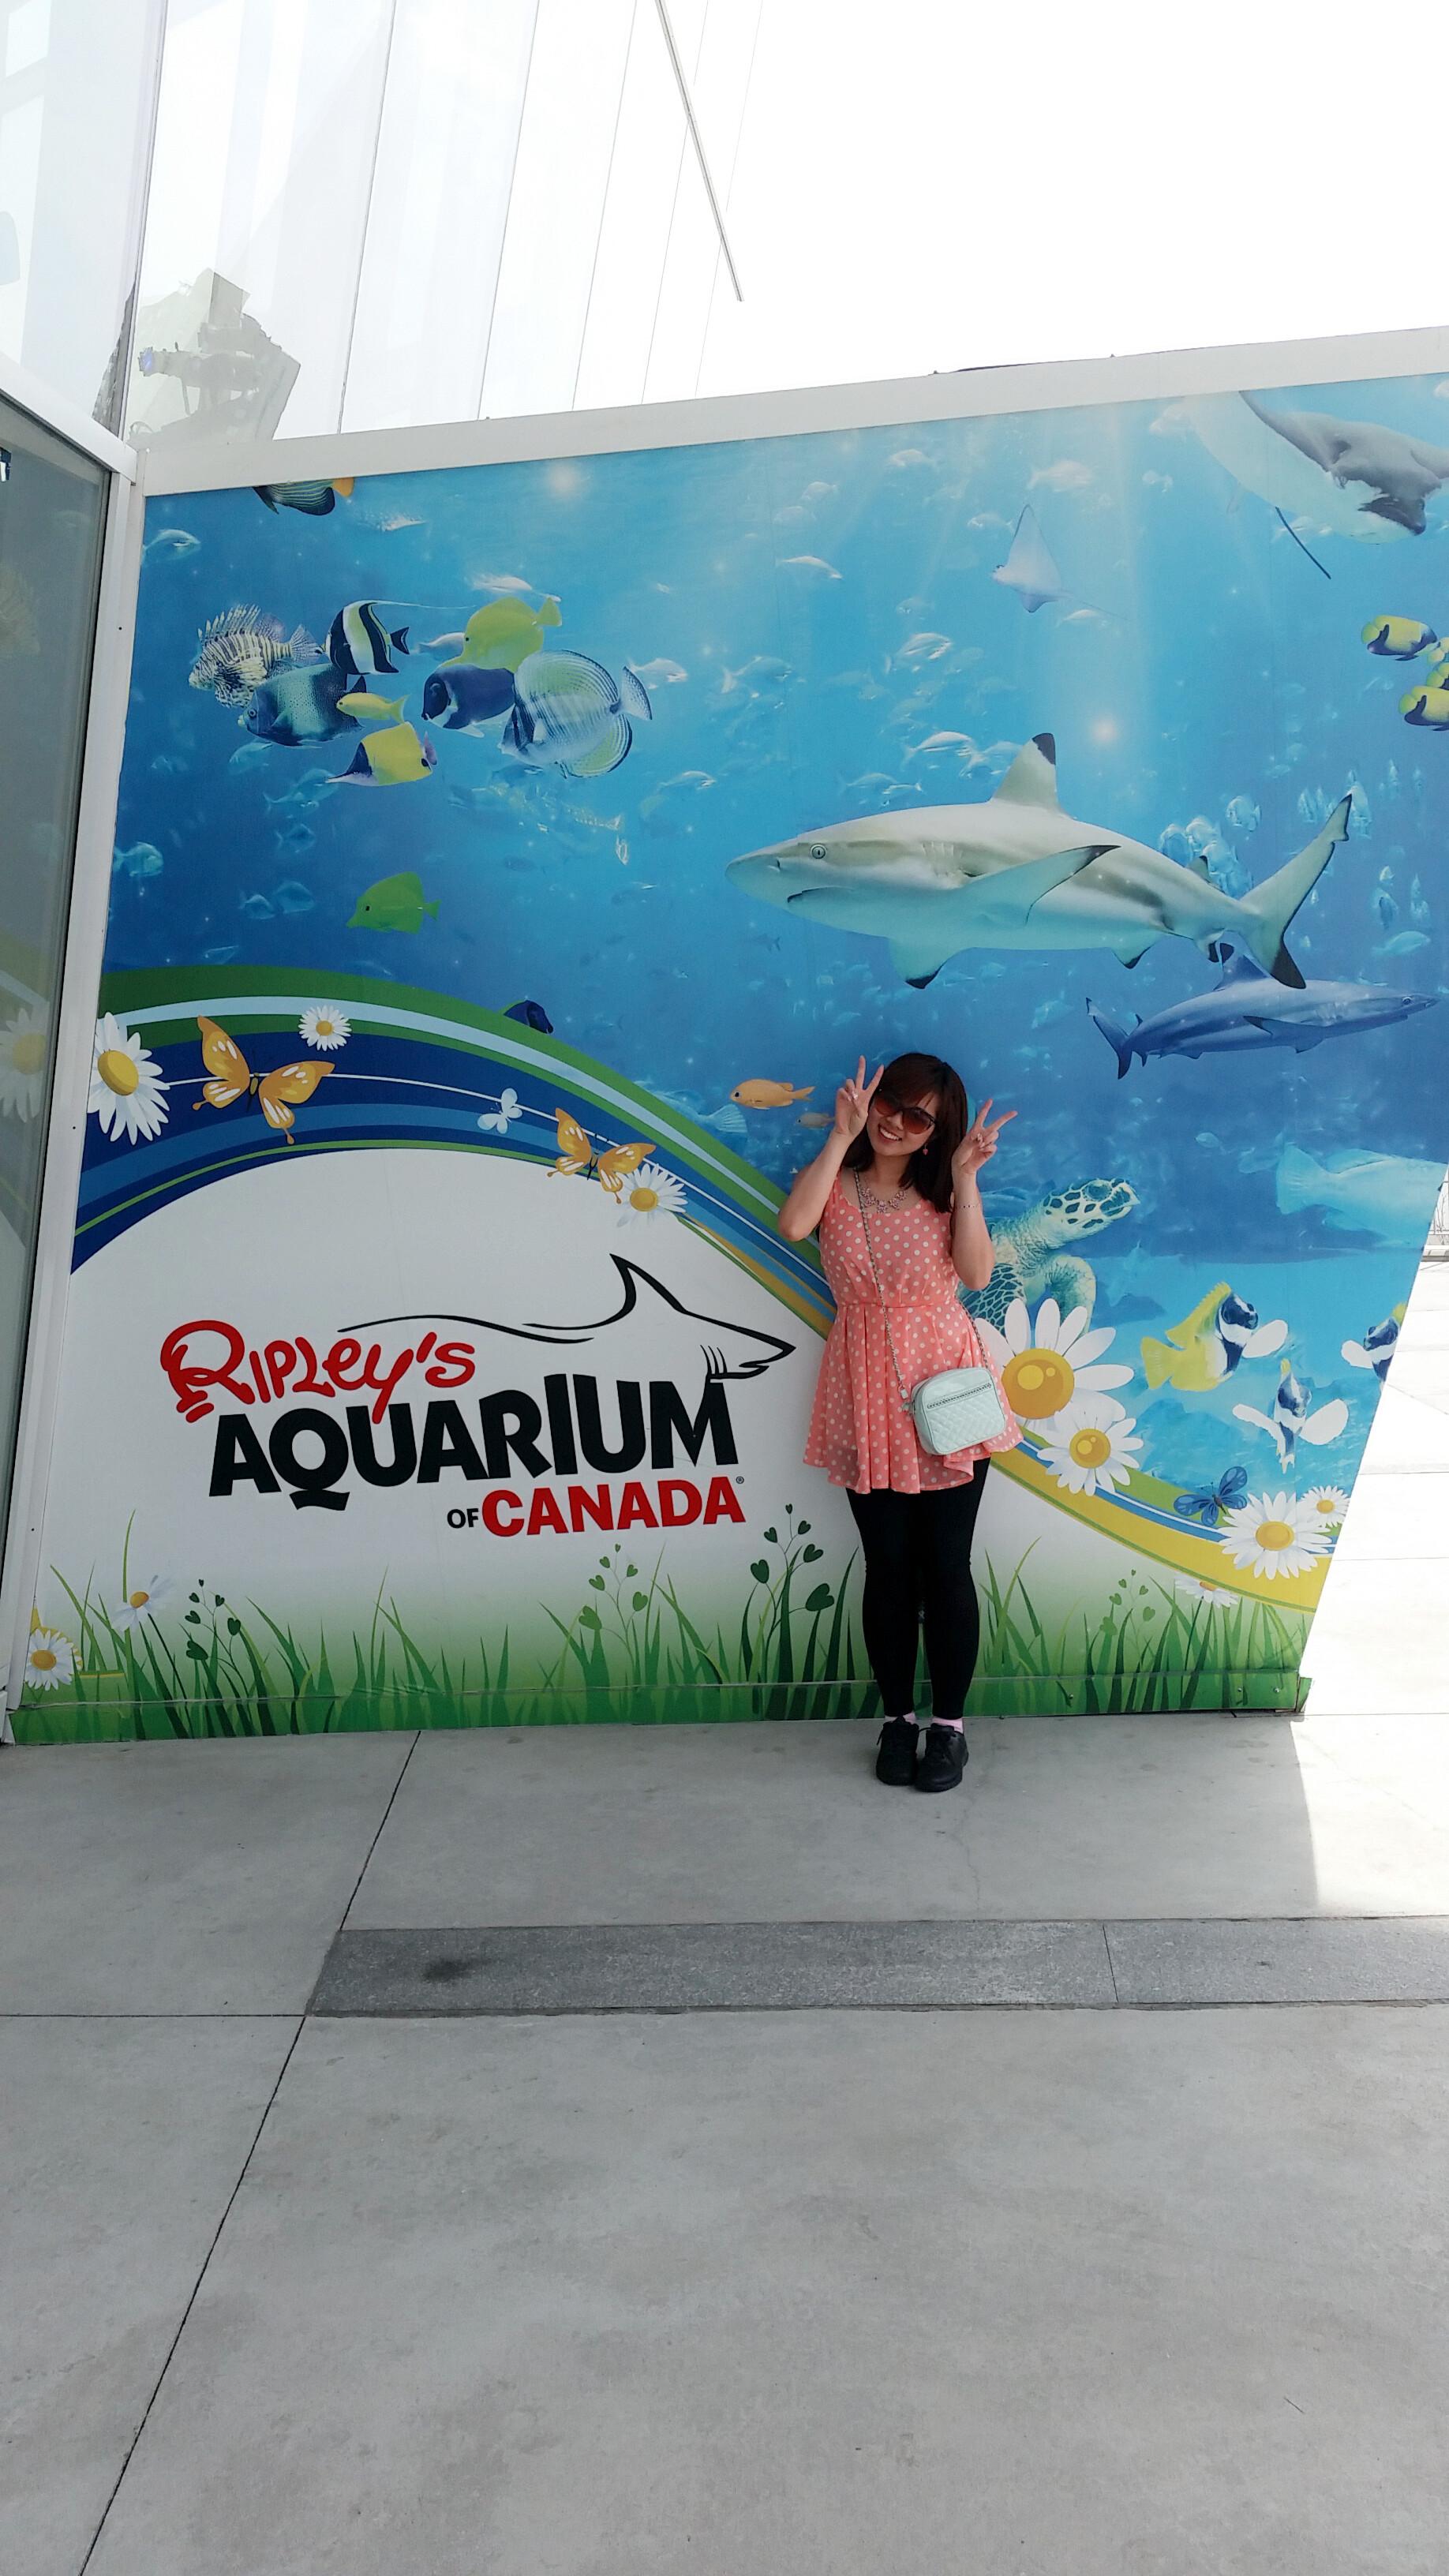 Ripley's aquarium toronto coupon code 2018